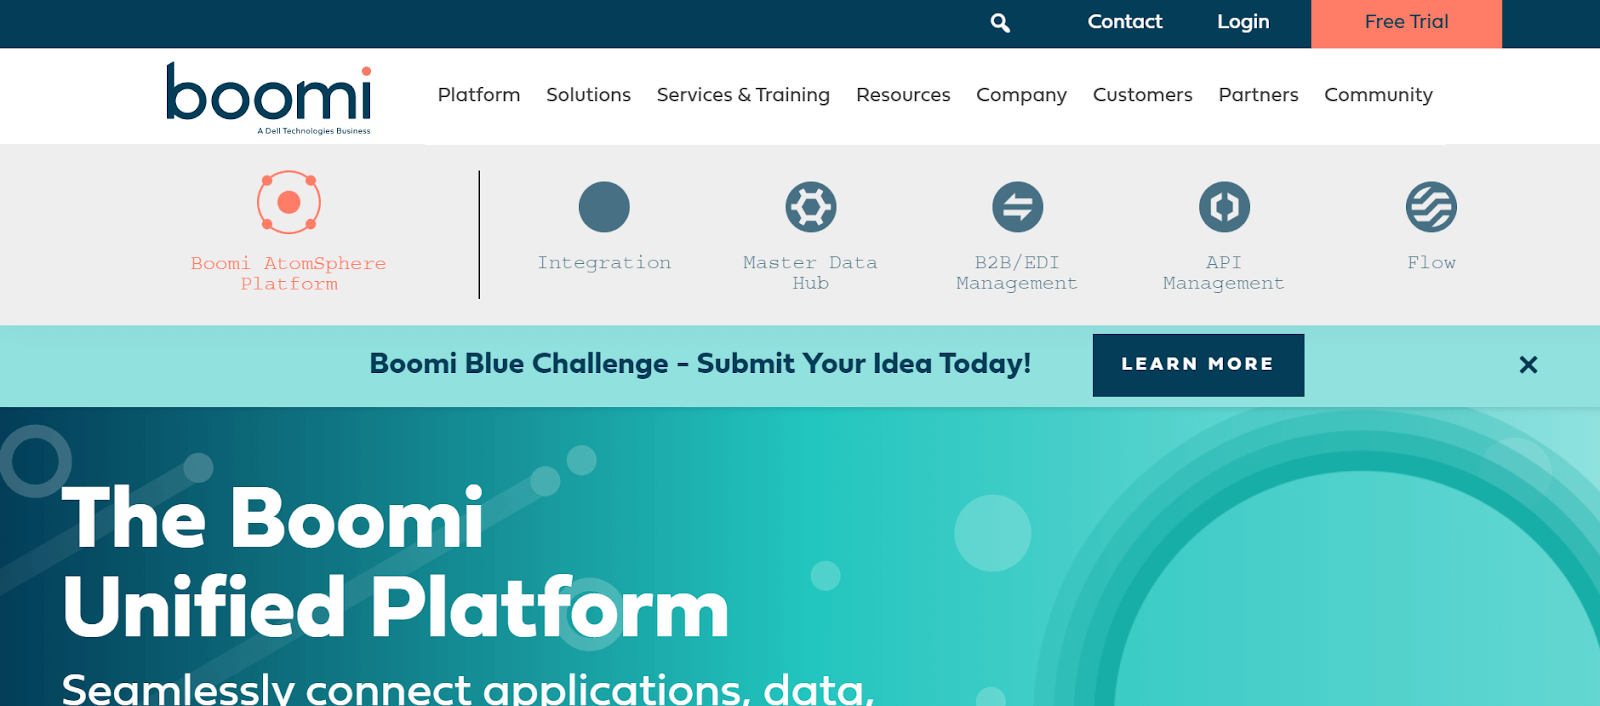 Boomi Data Management Tool